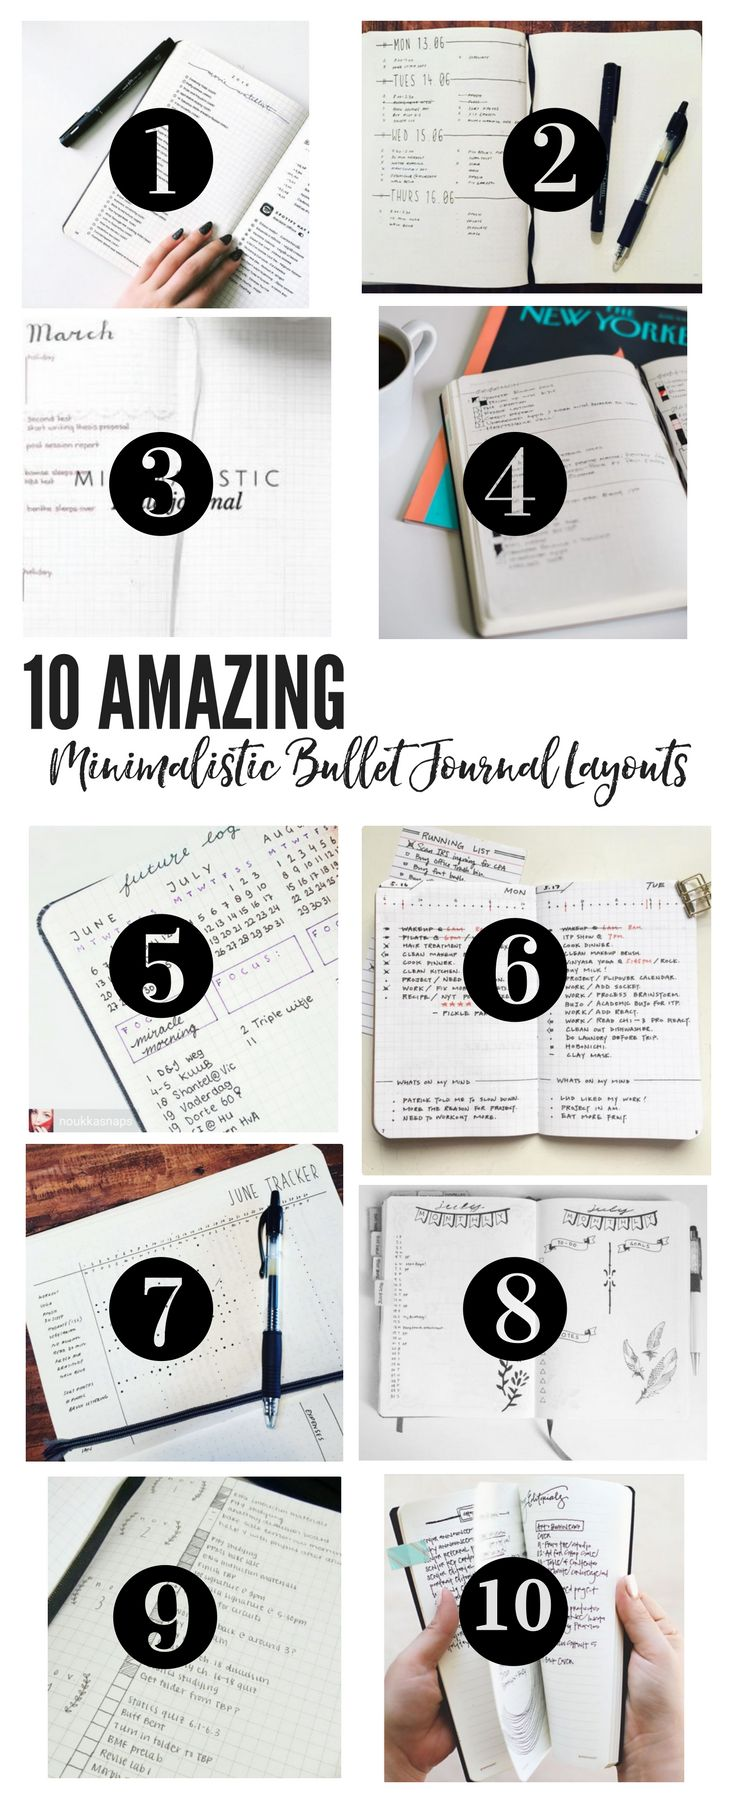 10 Amazing Minimalistic Bullet Journal Layouts